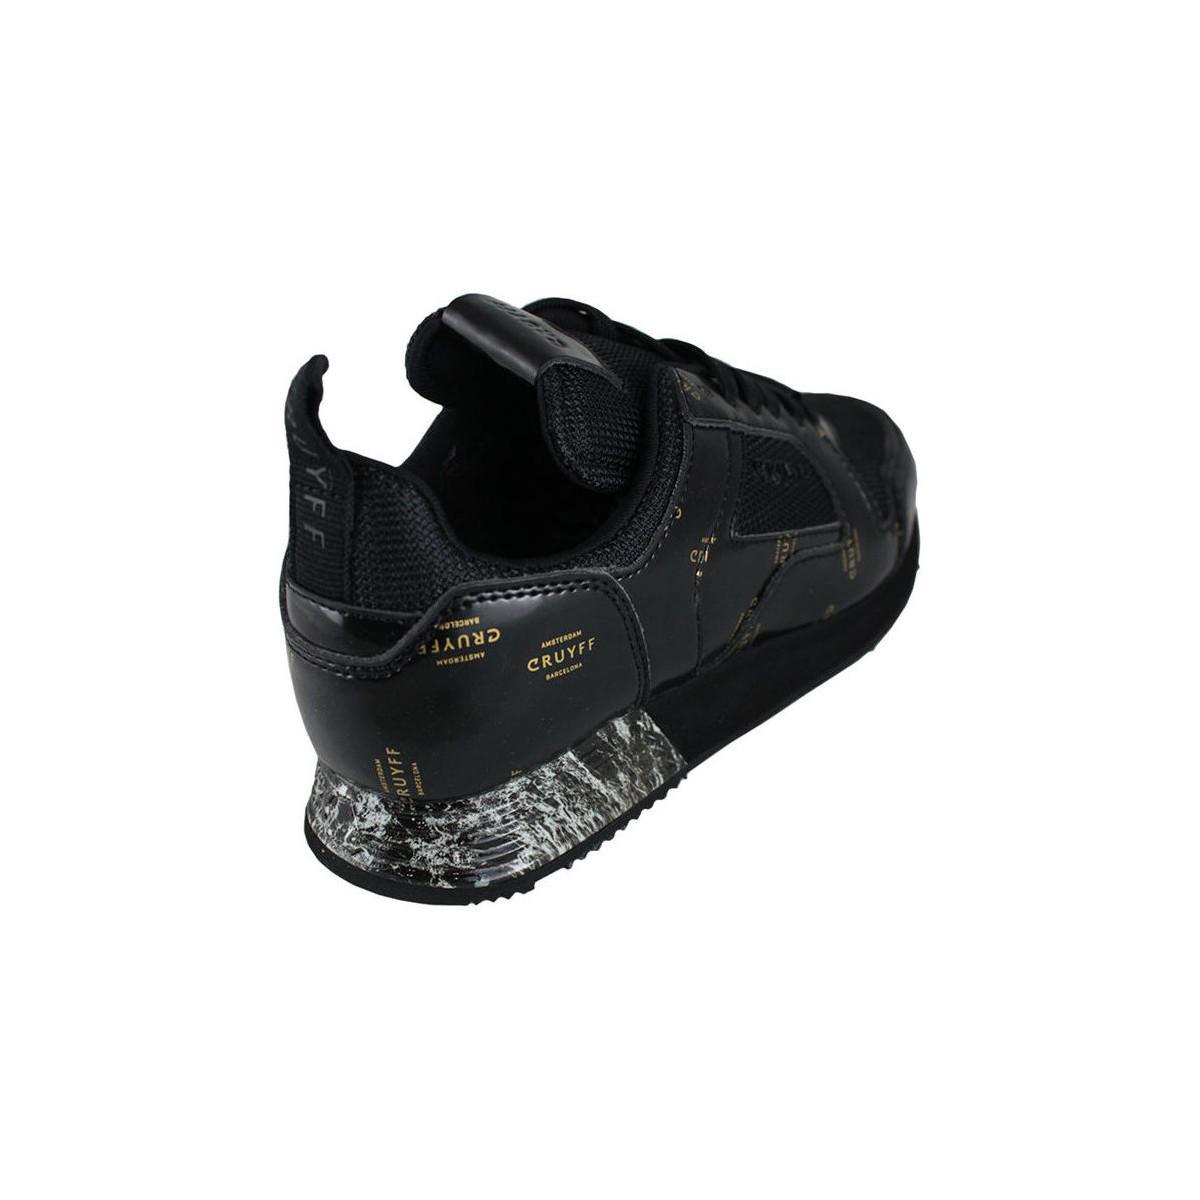 Baskets basses lusso black Cruyff h37h